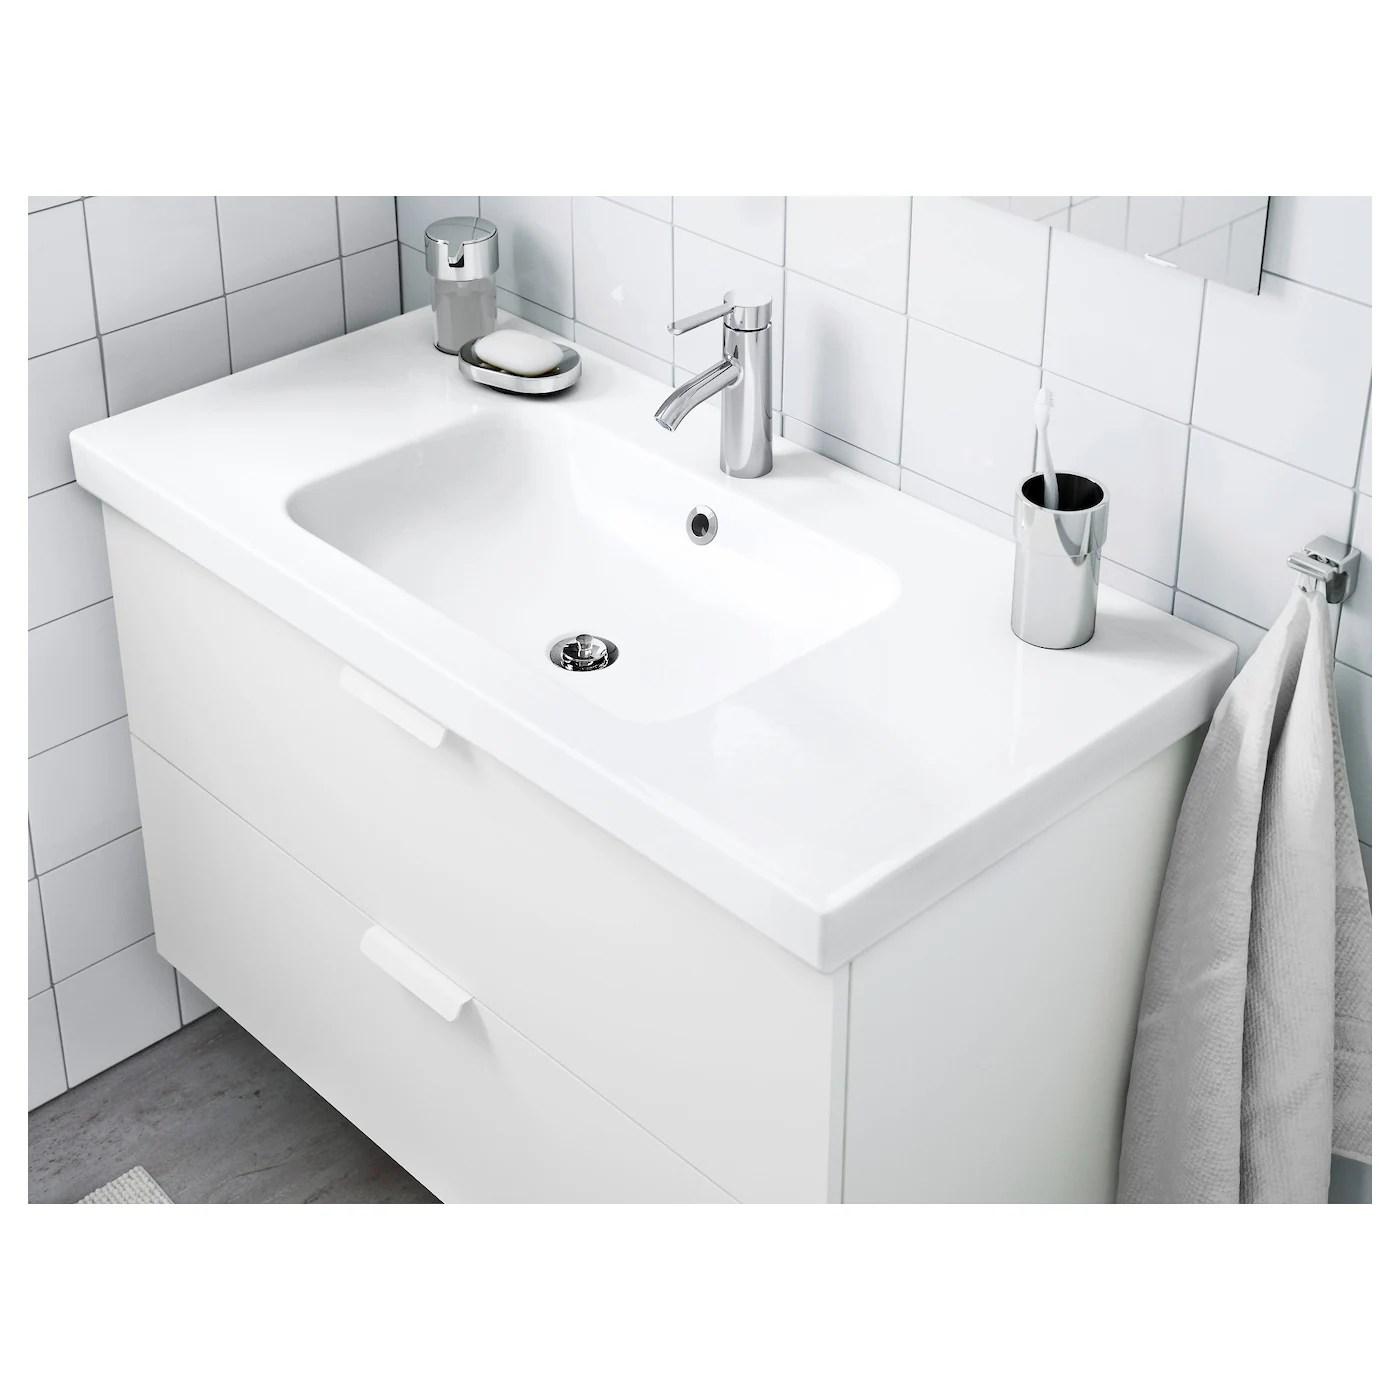 odensvik sink 40 1 2x19 1 4x2 3 8 103x49x6 cm